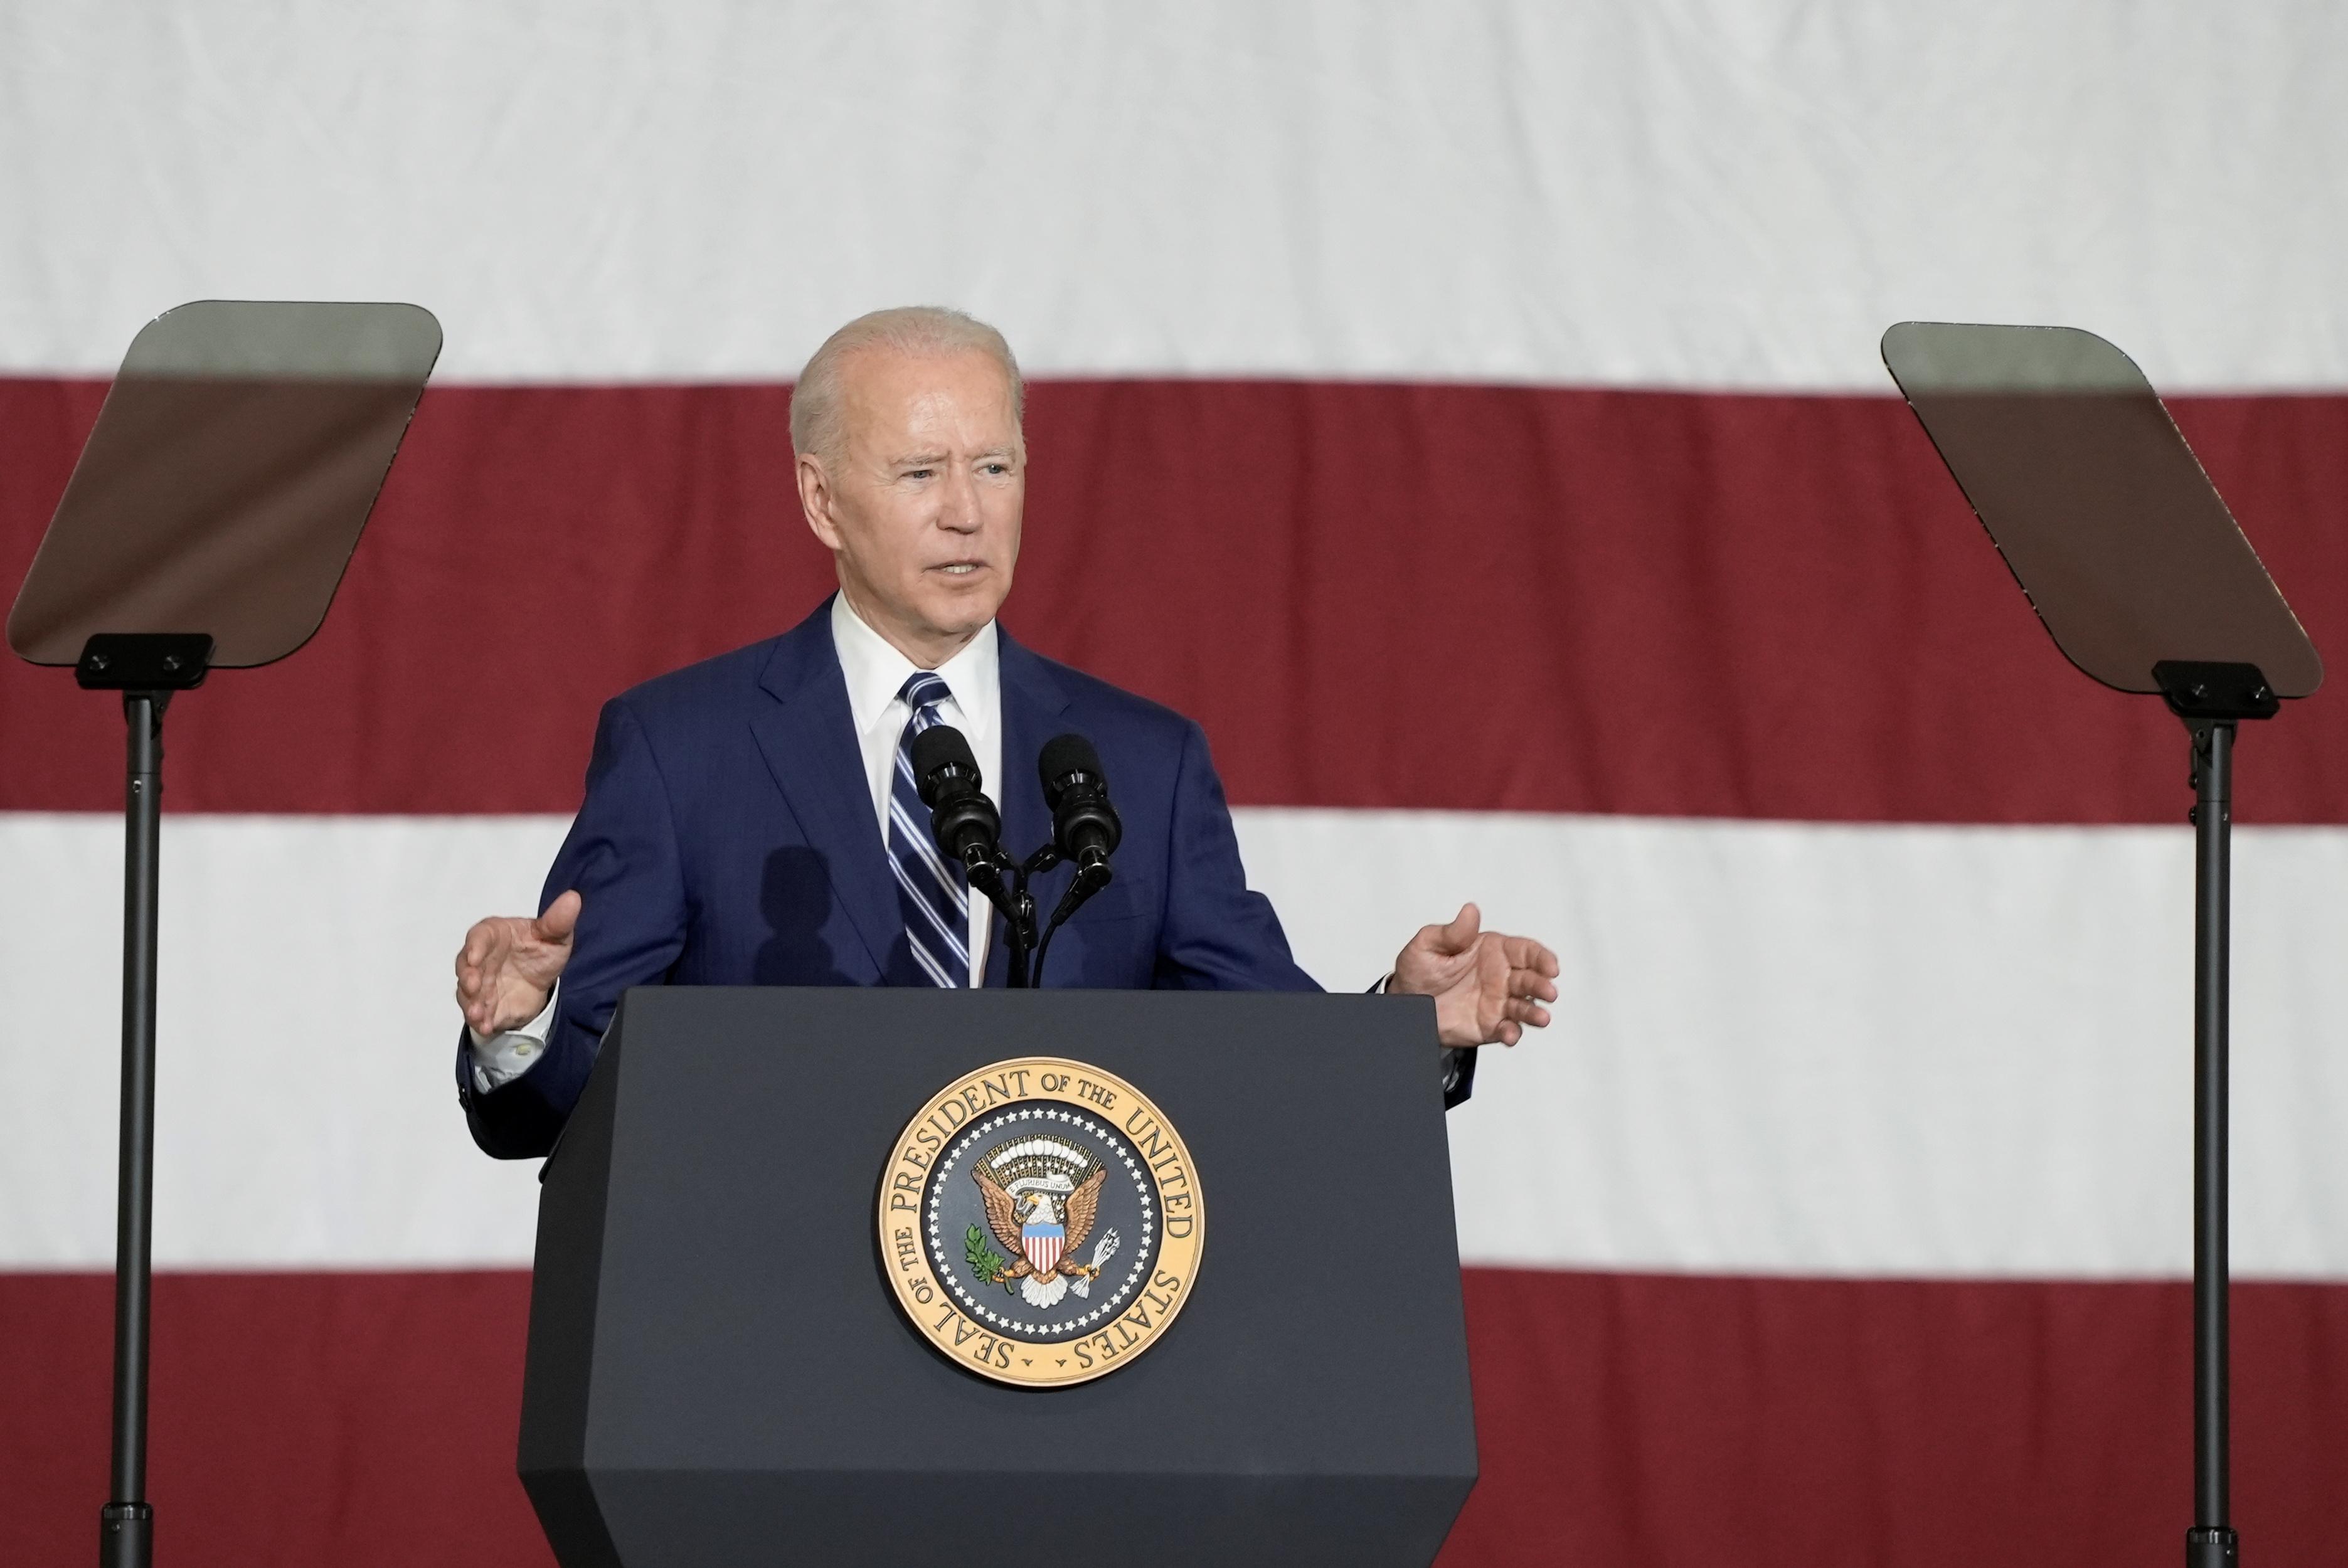 U.S. President Joe Biden speaks as he visits Joint Base Langley-Eustis with first lady Jill Biden, in Hampton, Virginia, U.S. May 28, 2021. REUTERS/Ken Cedeno